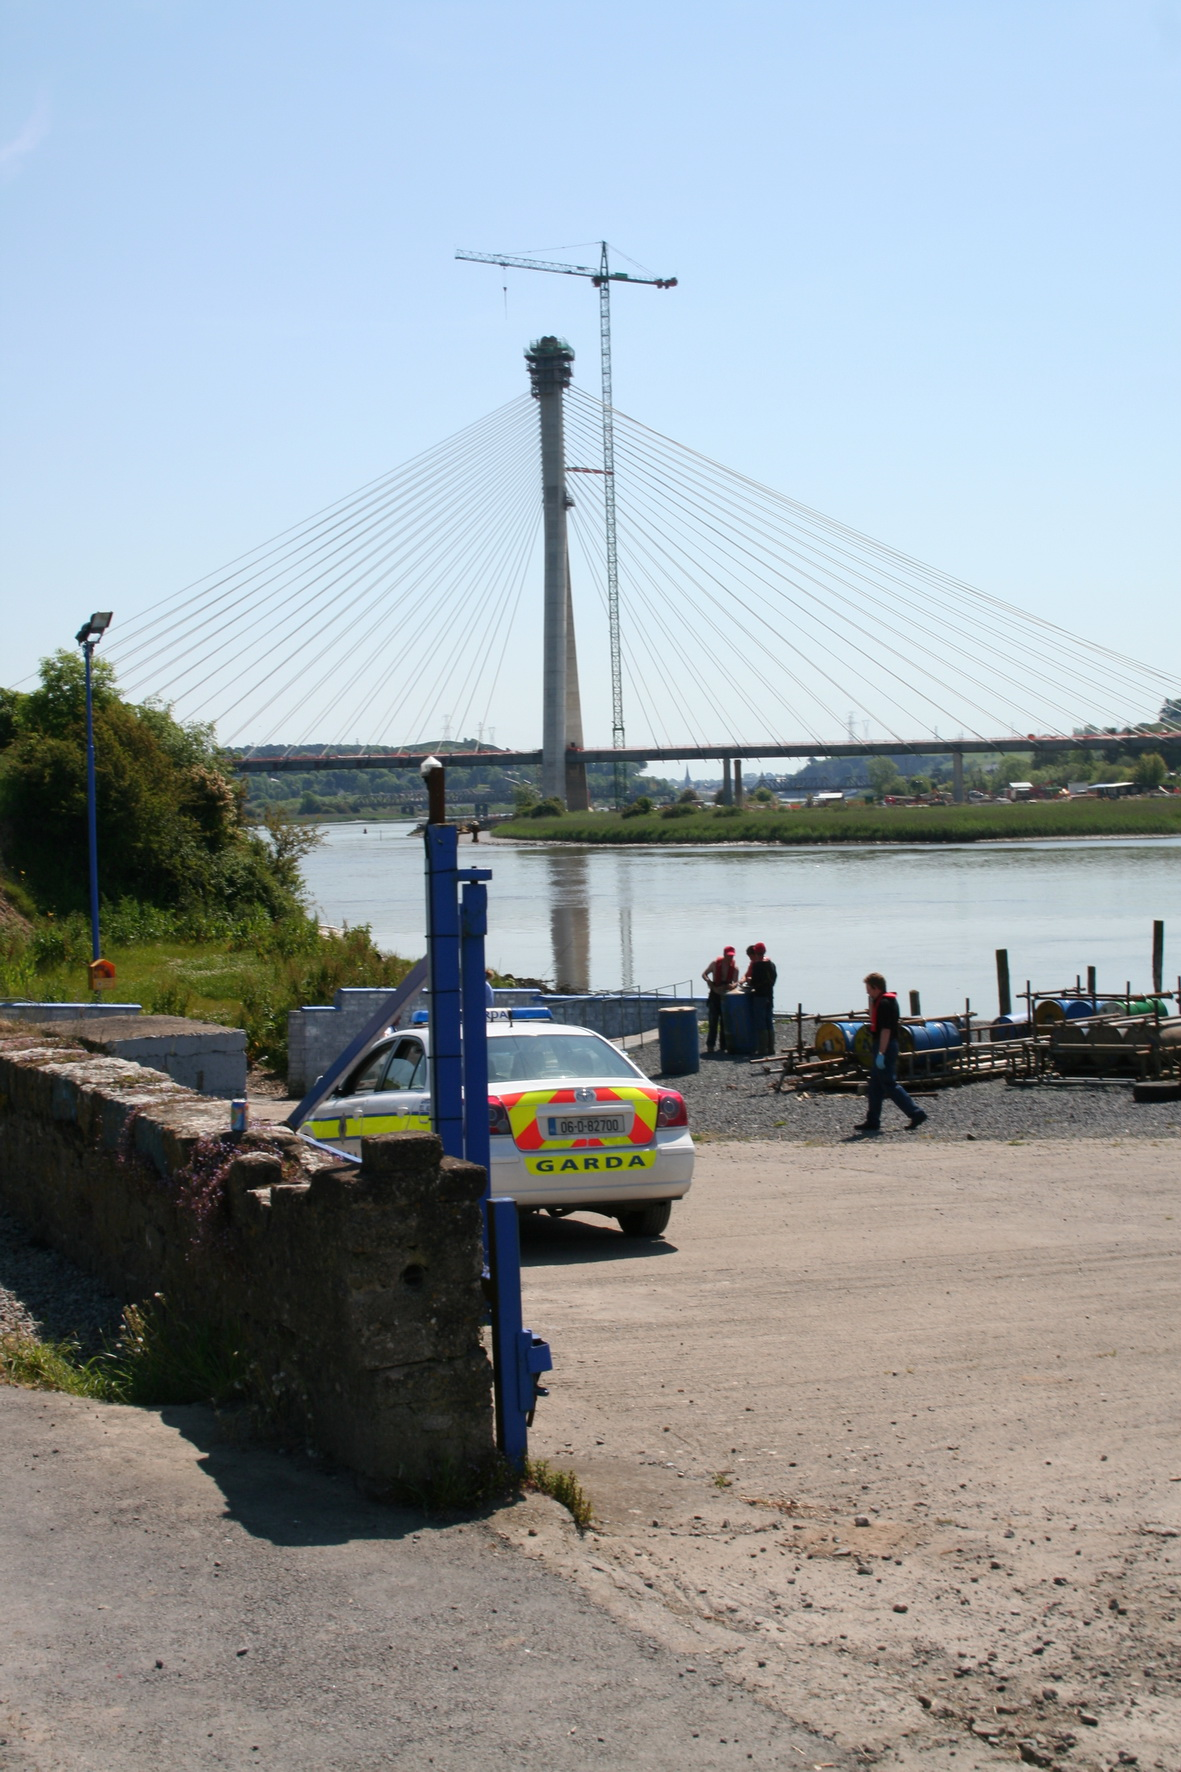 The new Waterford bridge